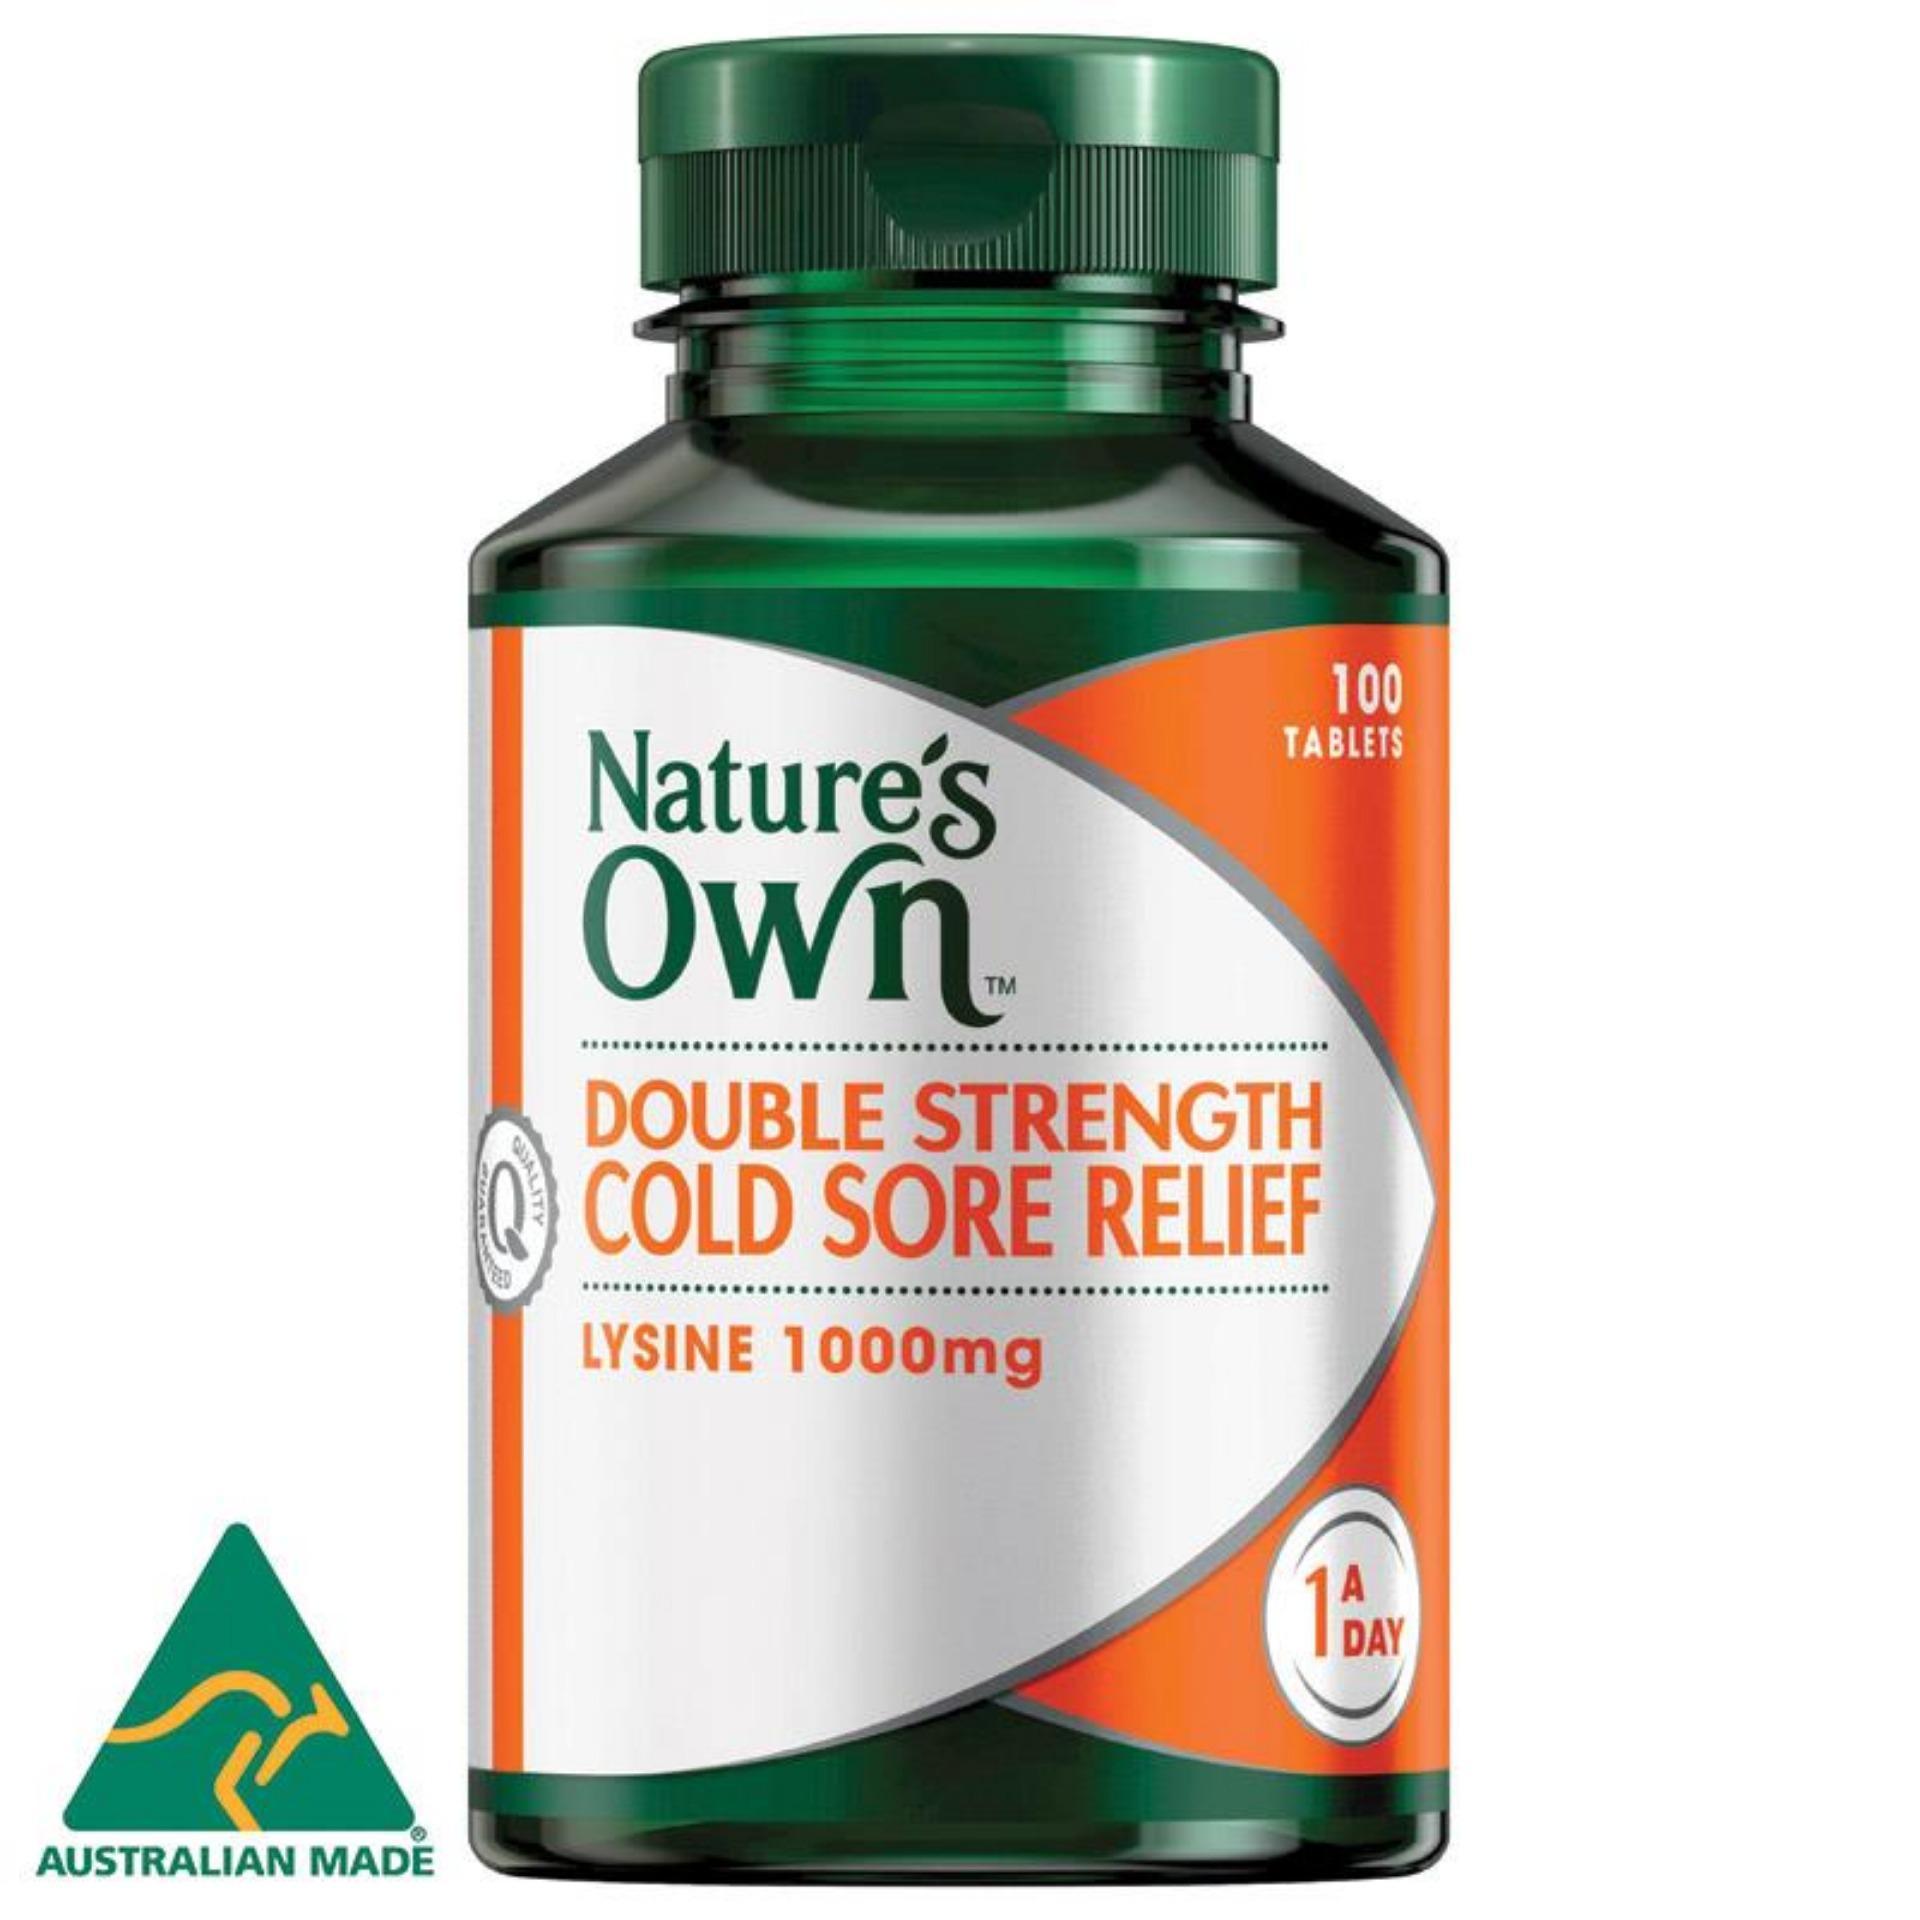 Natrabio Adult Cough Syrup 240 Ml Sirup Obat Batuk Berdahak Kering Pilek Yang Seng Pei Pa Mat Herbal Panas Source Natures Own Double Strength